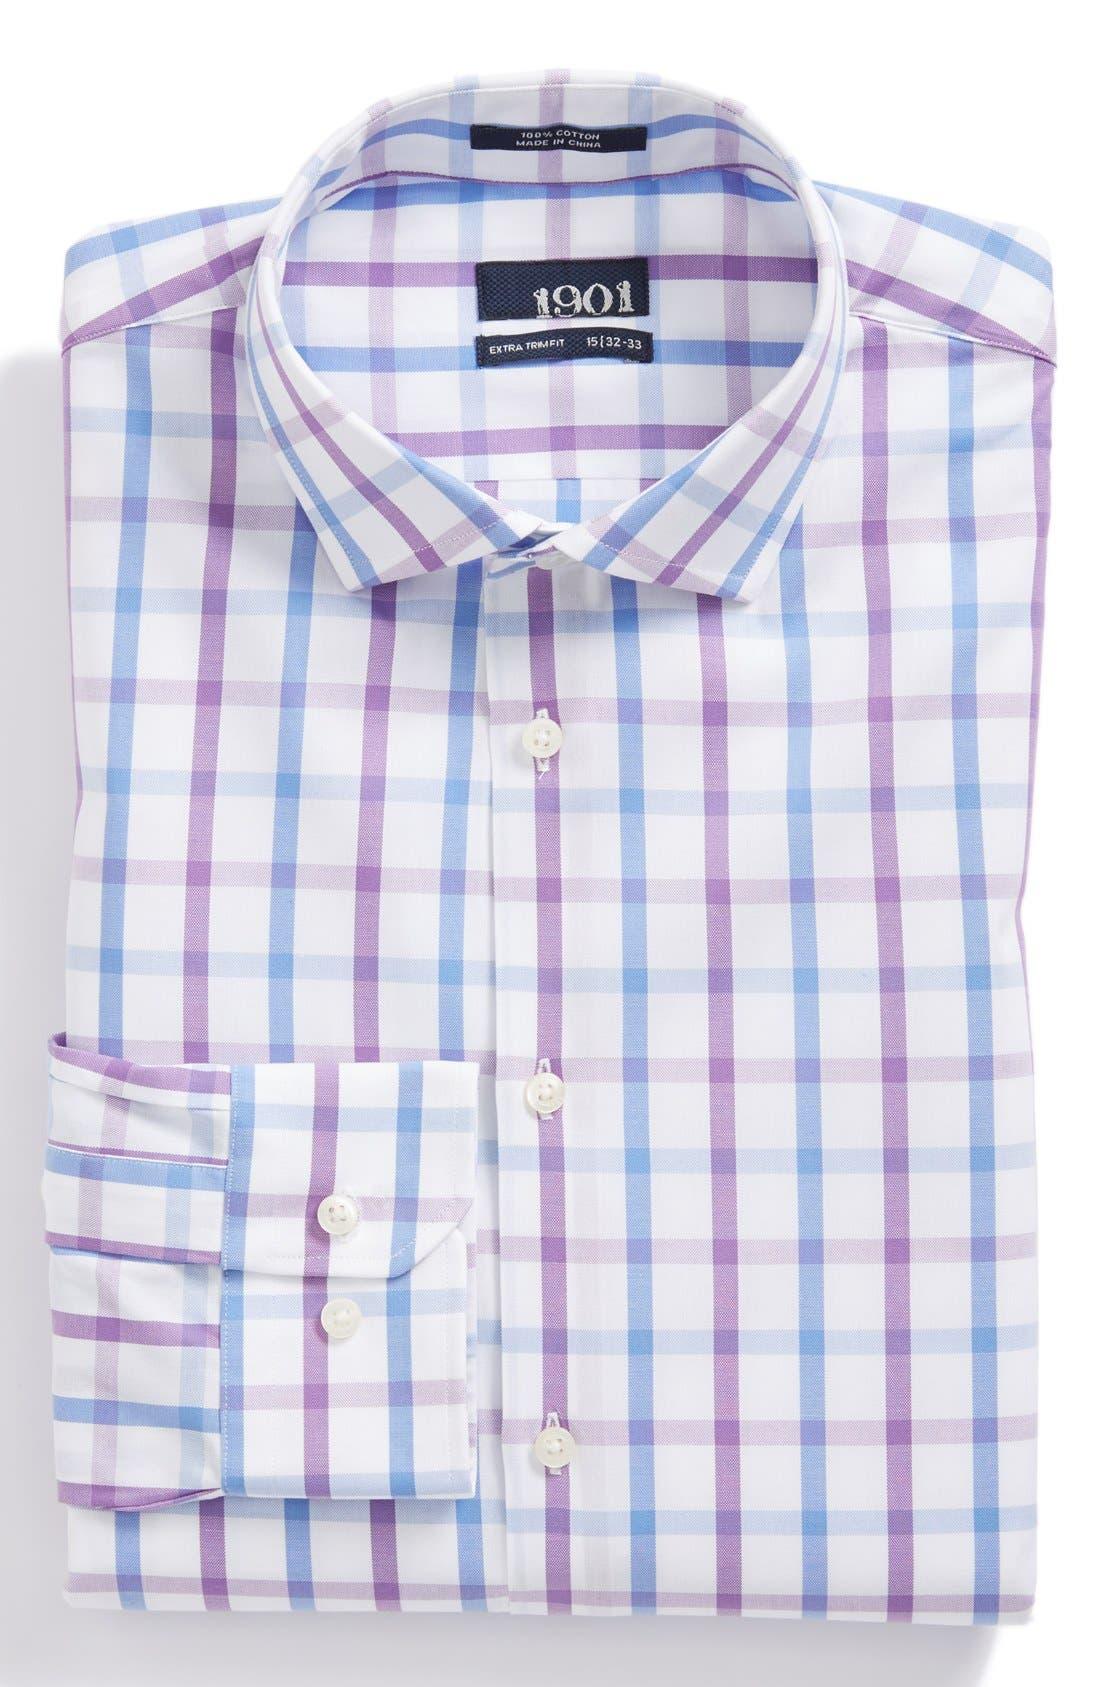 Main Image - 1901 Extra Trim Fit Dress Shirt